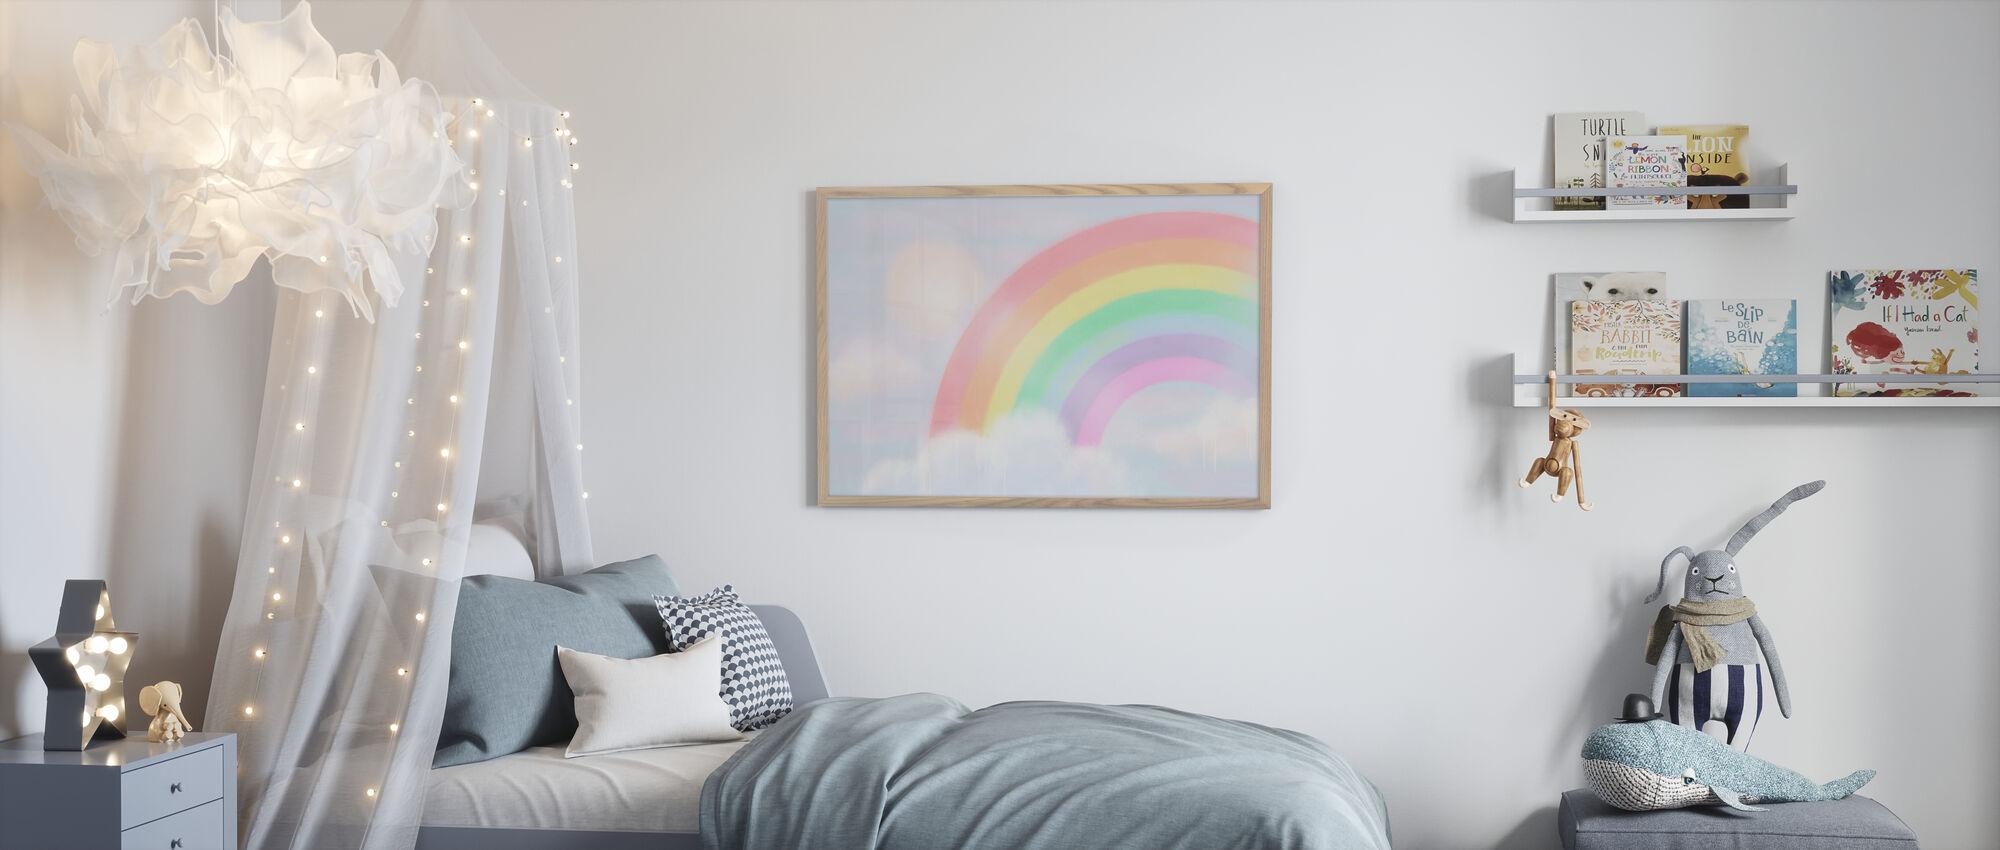 Glitrende Rainbow II - Plakat - Barnerom